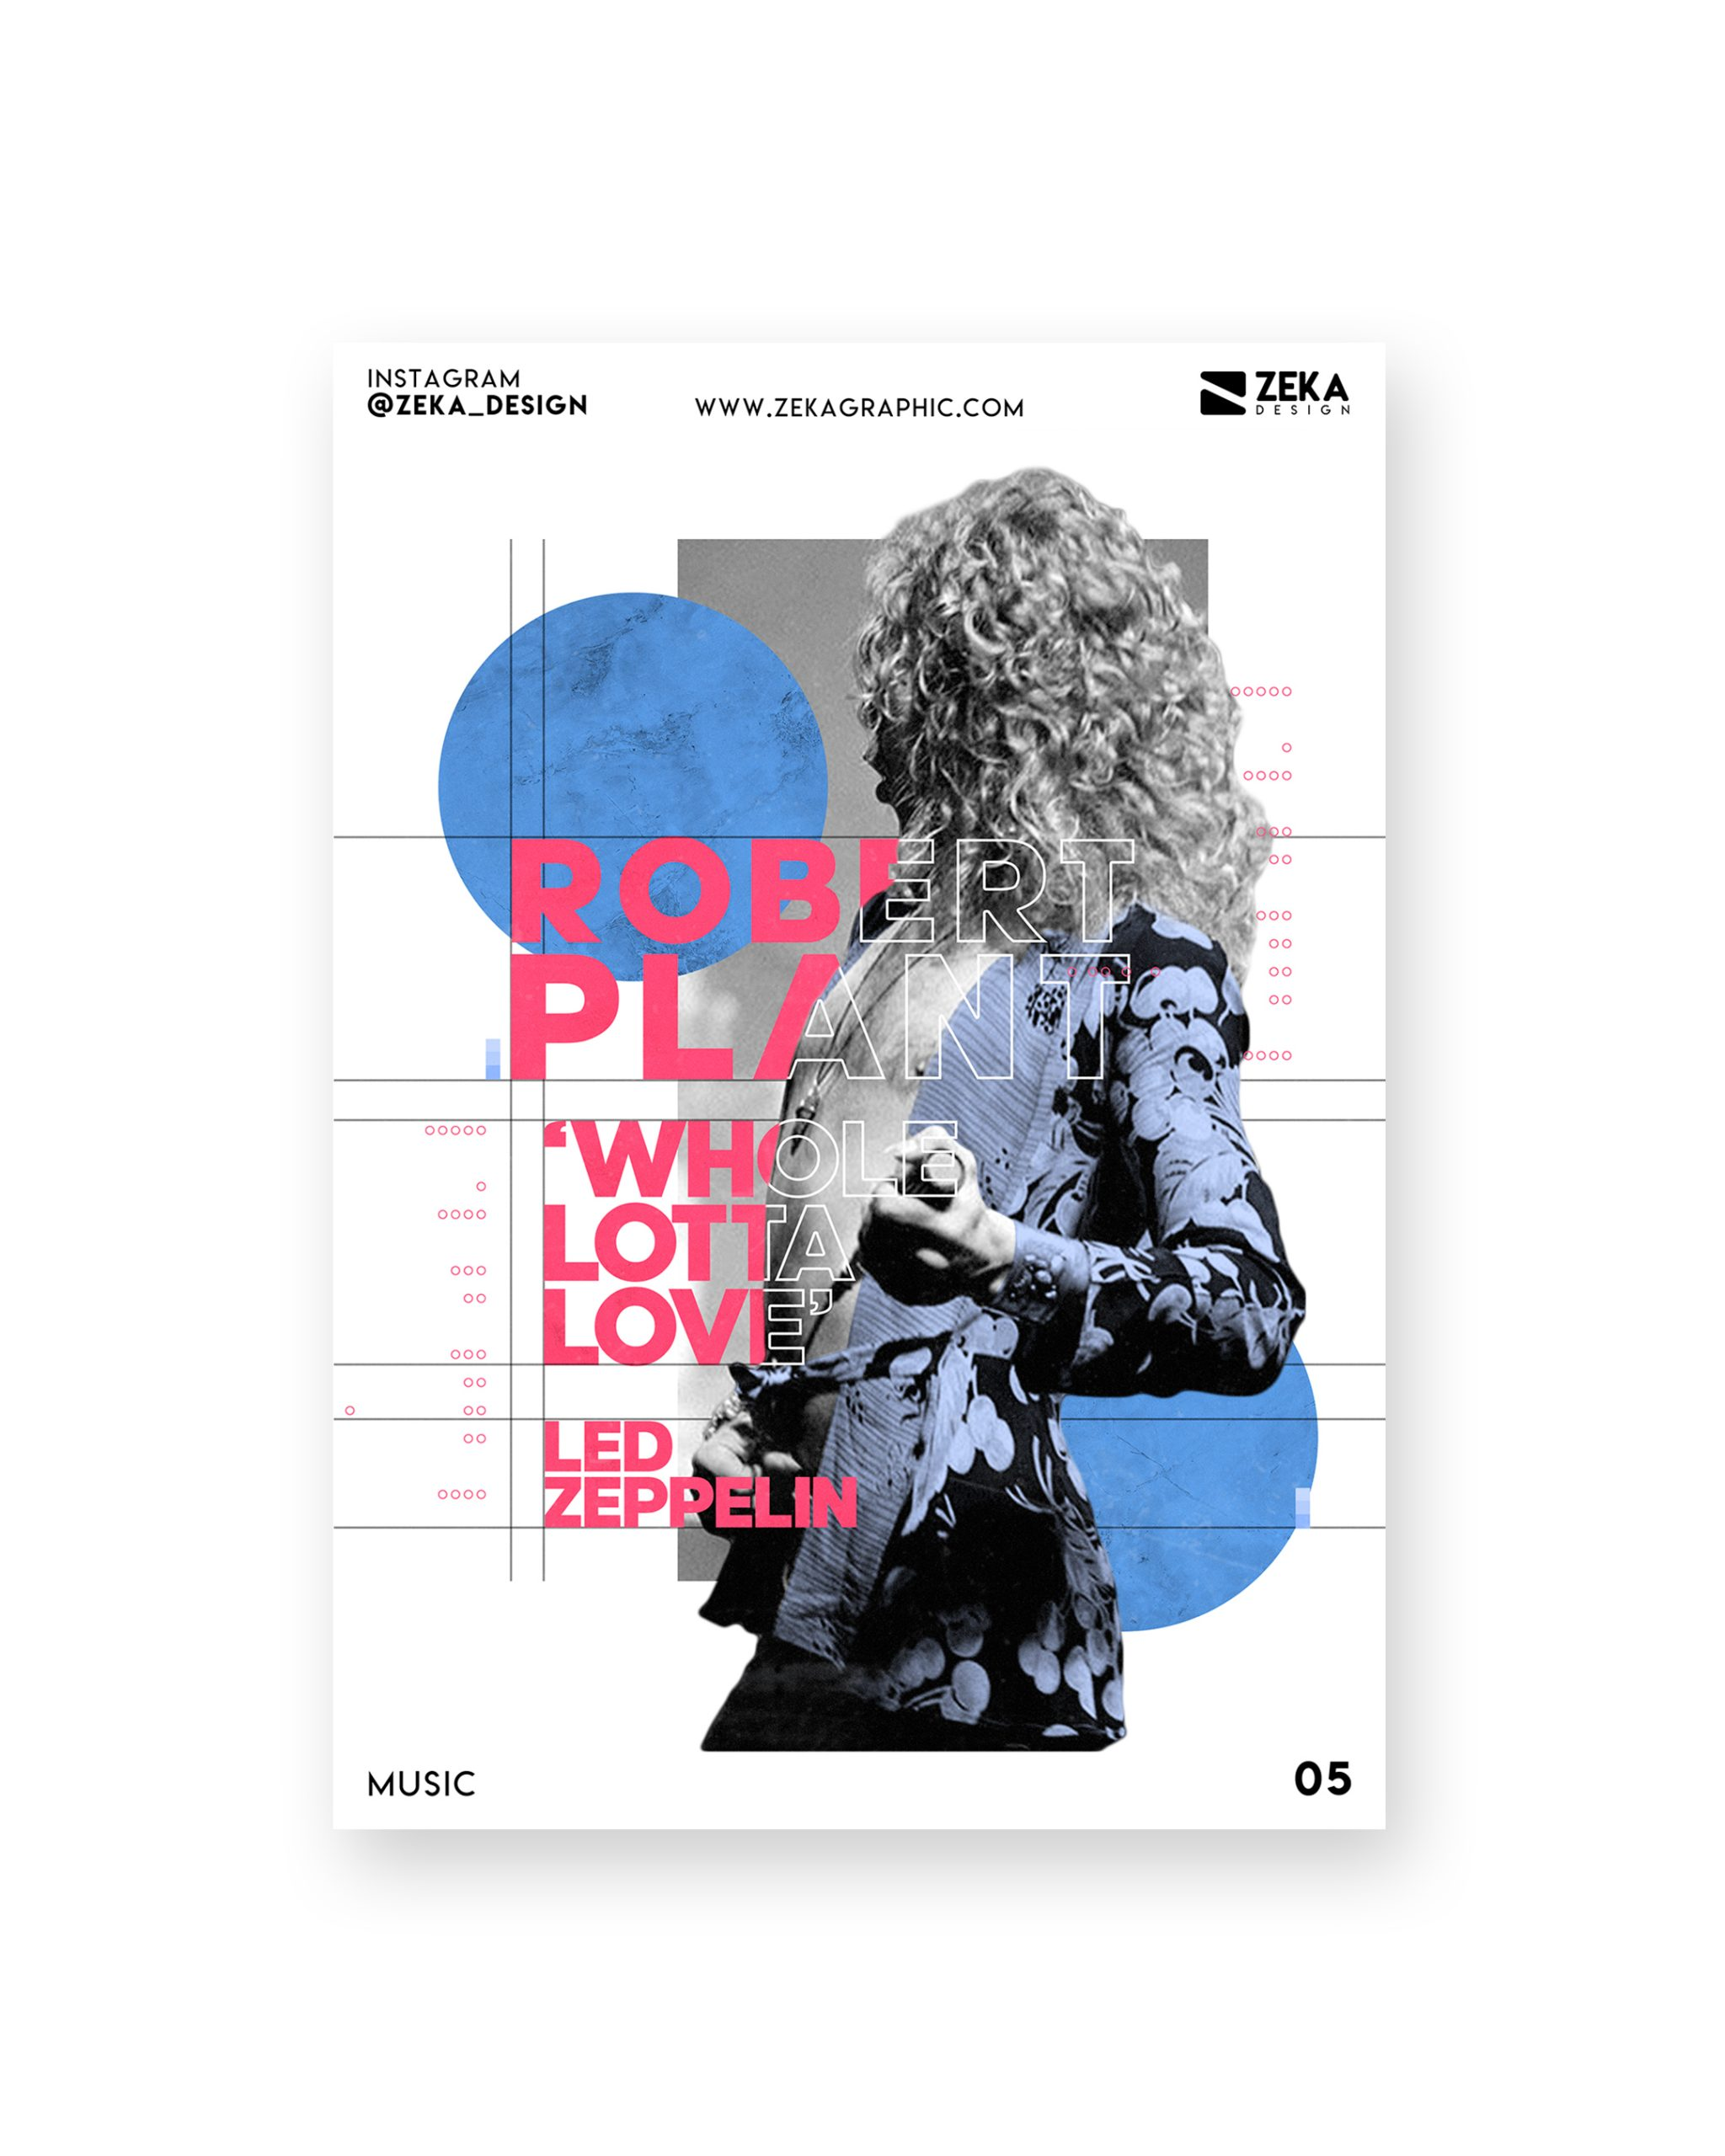 Led Zeppelin Music Poster Design Collection Zeka Design